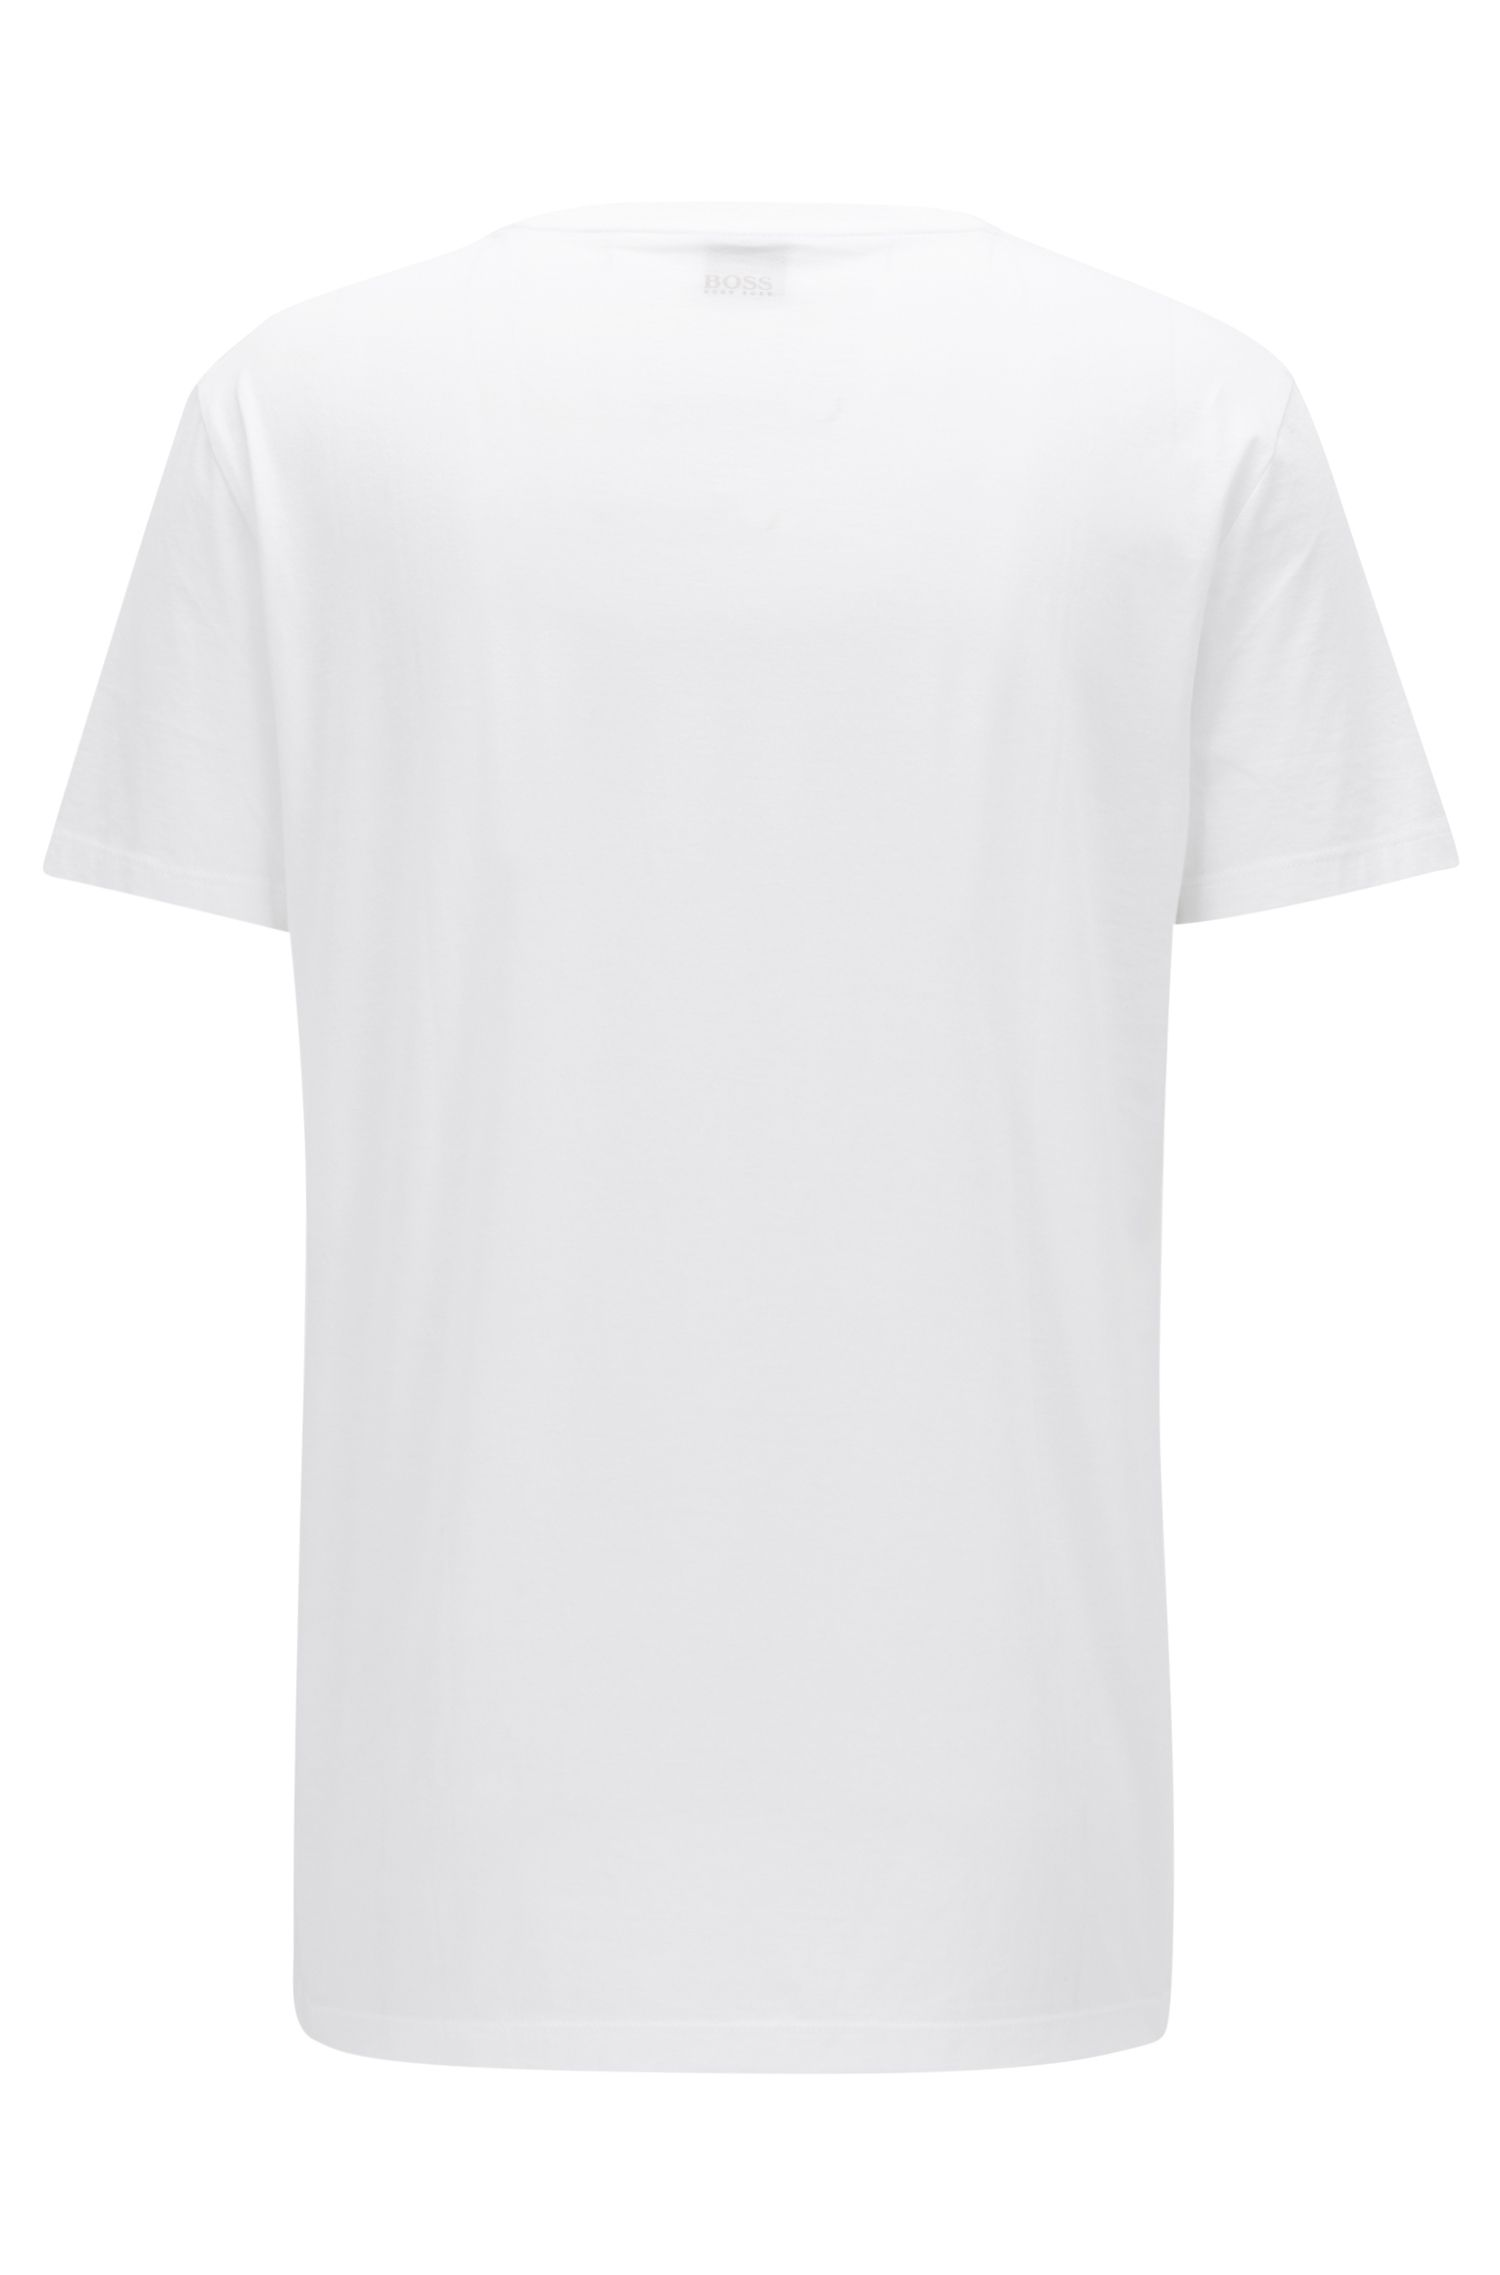 Bird Of Paradise Graphic T-Shirt | Timen, White